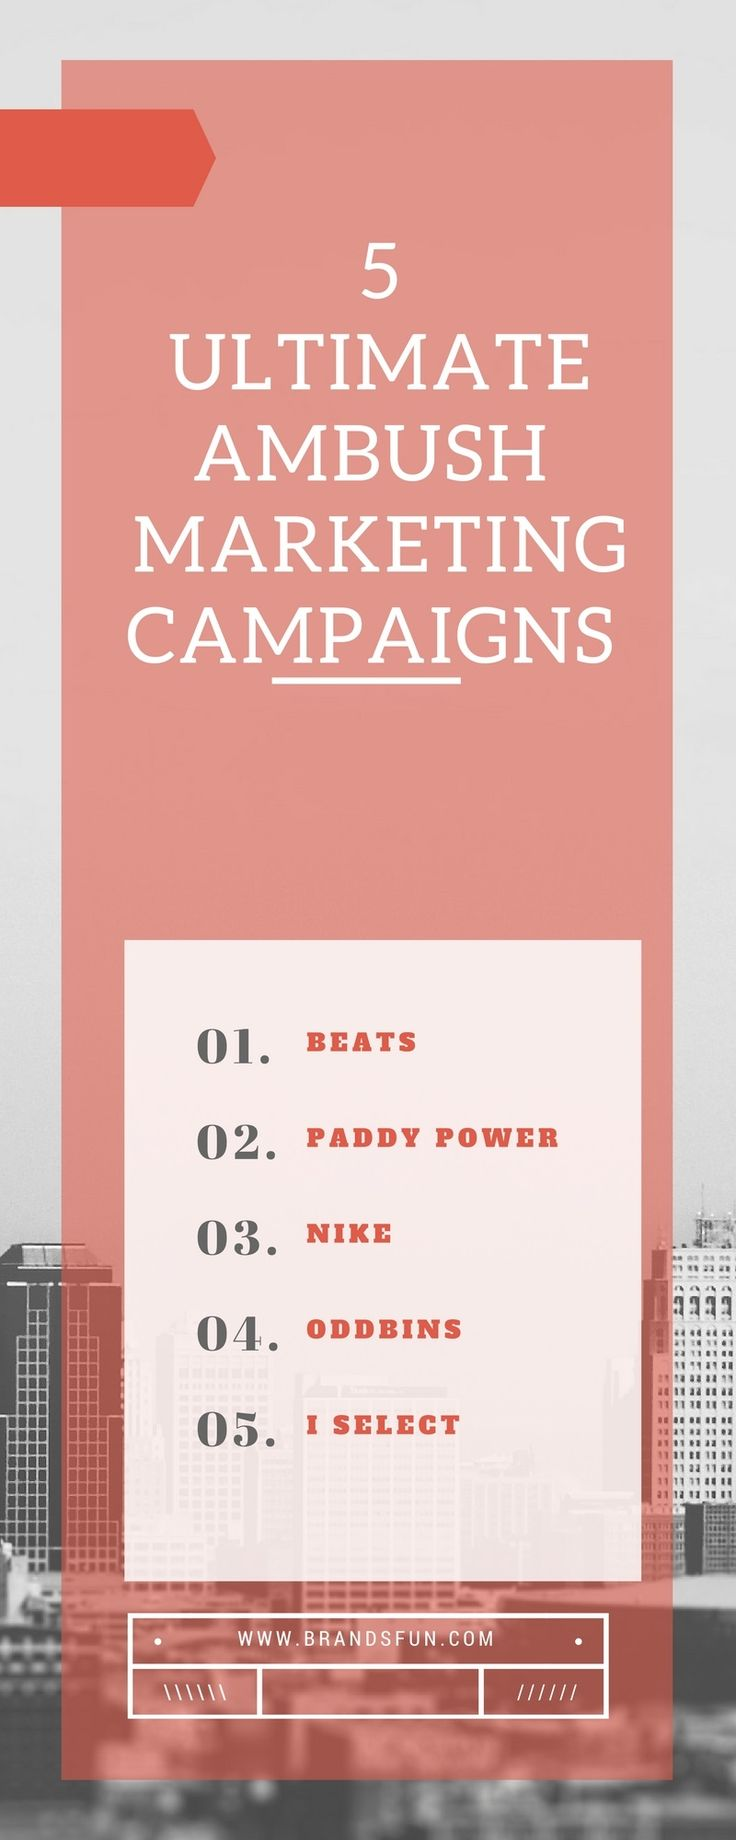 5 Ulimate ambush marketing campaigns that gatecrashed the #olympics